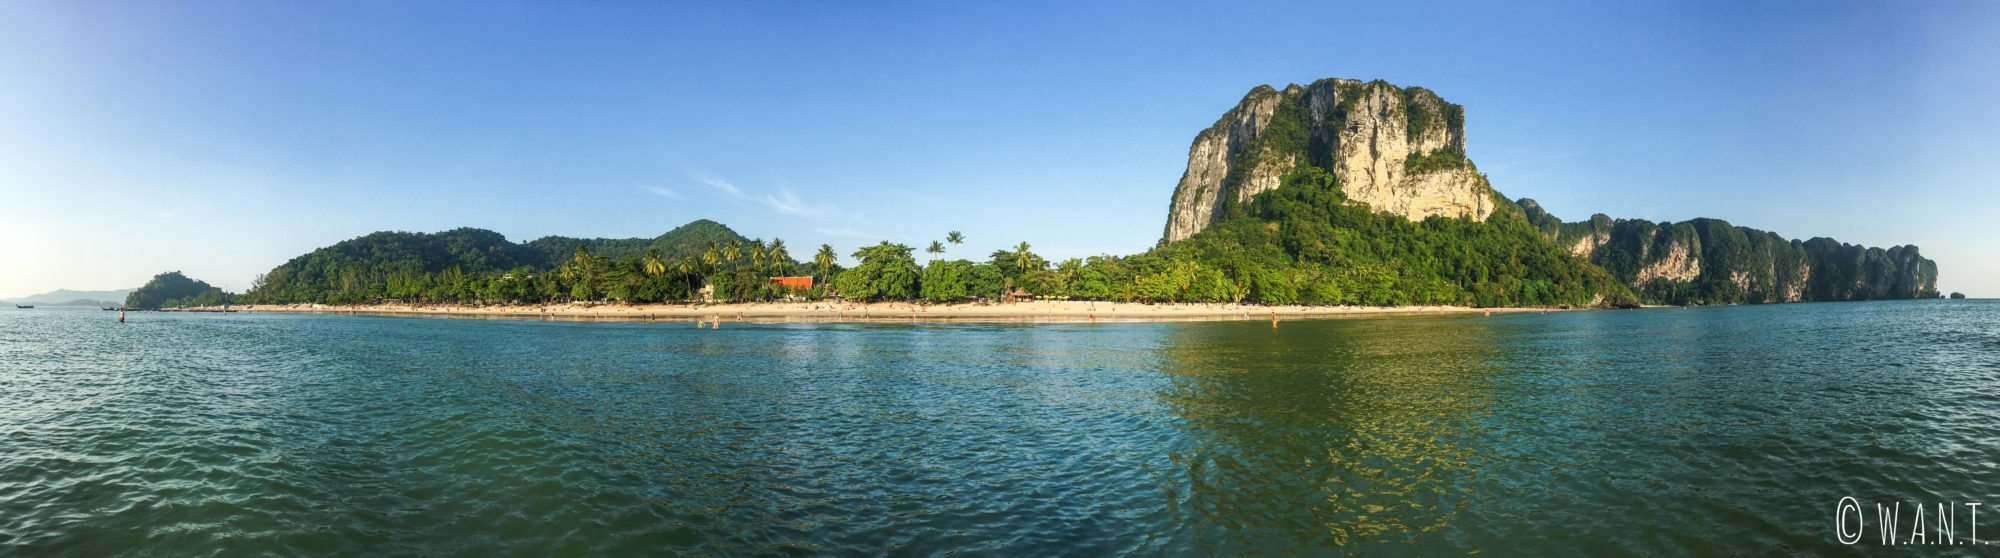 Panorama de Ao Nang Beach dans la province de Krabi